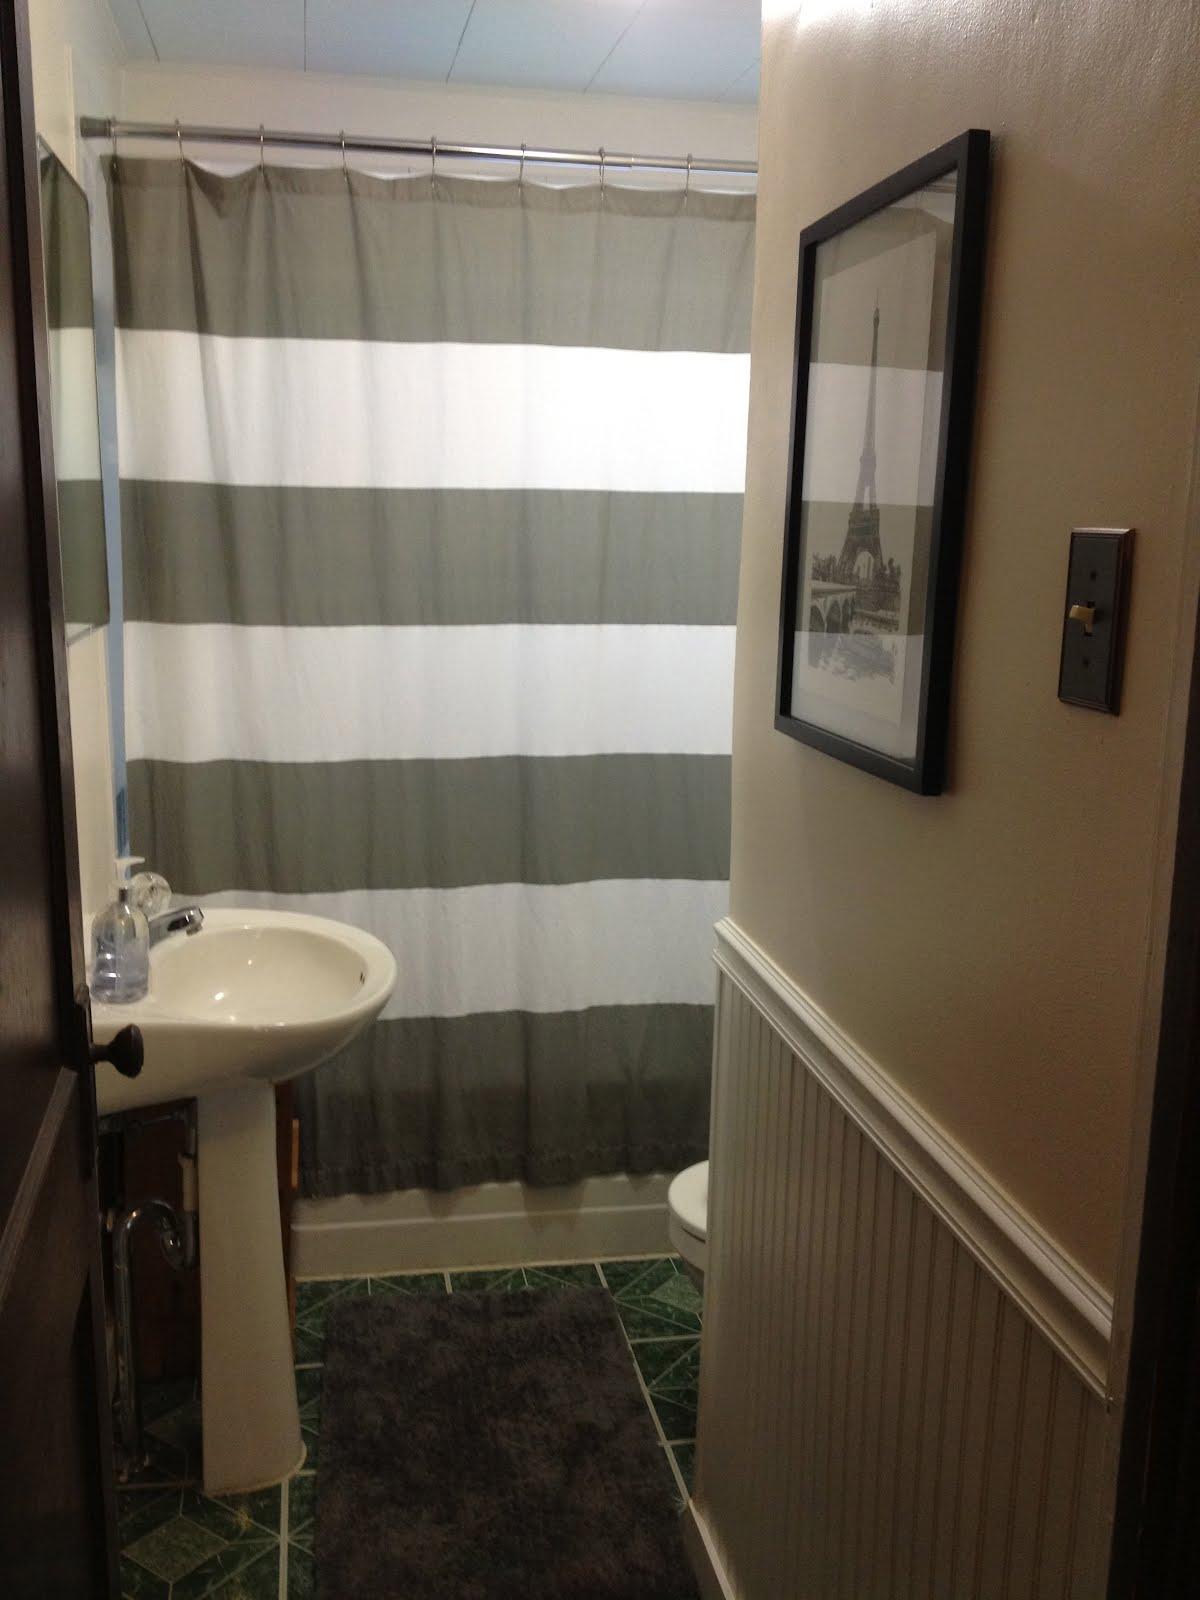 us case al bathroom heights home suite court remodeling birmingham design improvements mapquest alabama cahaba